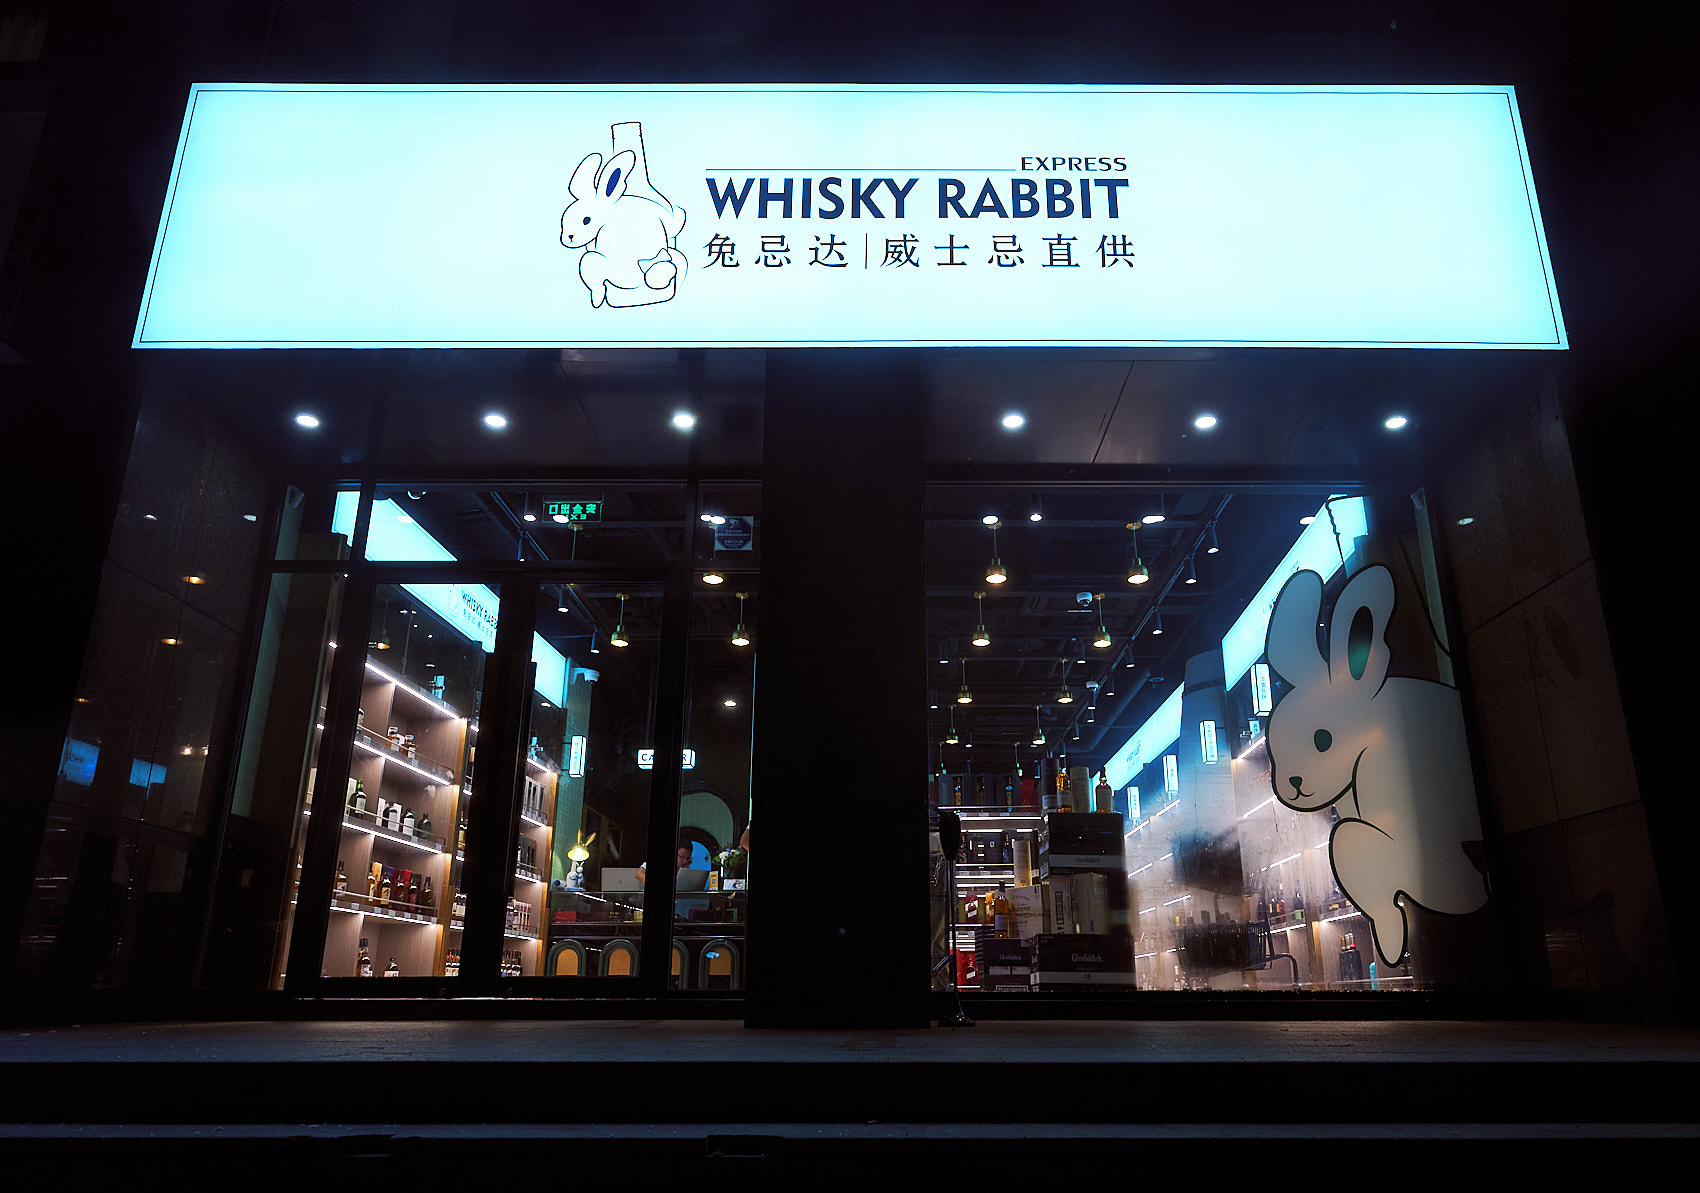 Whisky Rabbit Express Shanghai